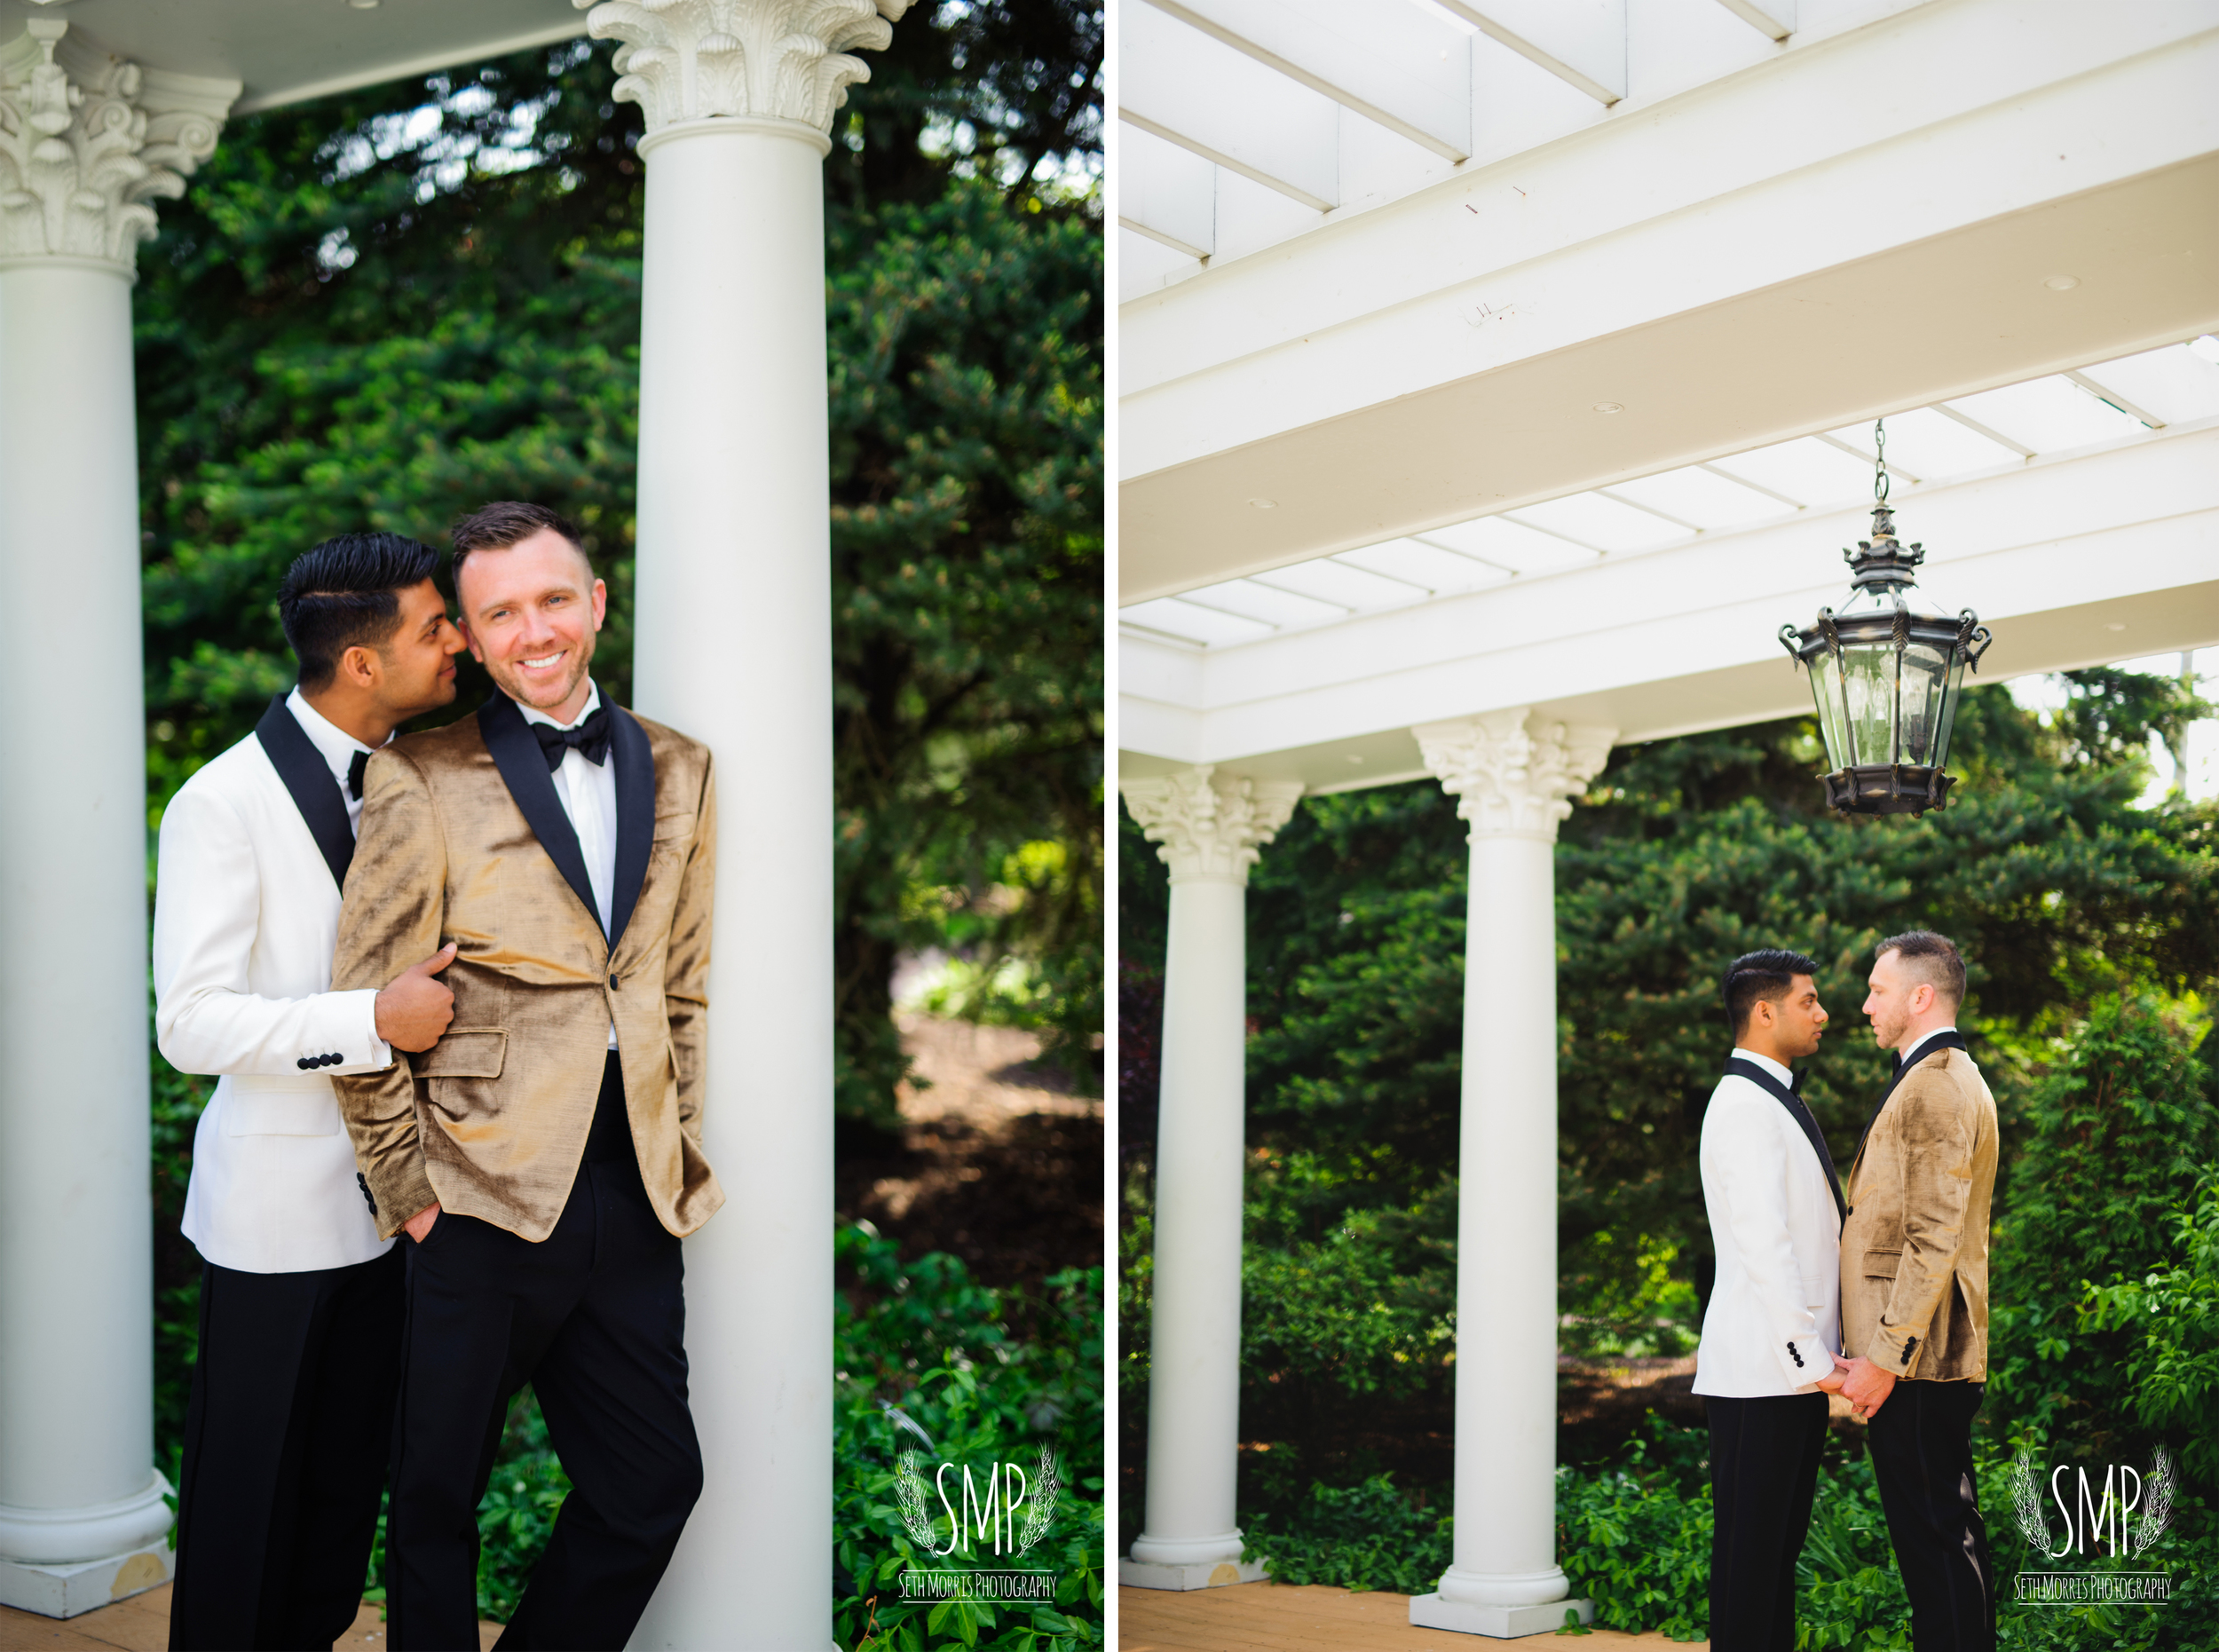 same-sex-wedding-photographer-chicago-illinois-27.jpg